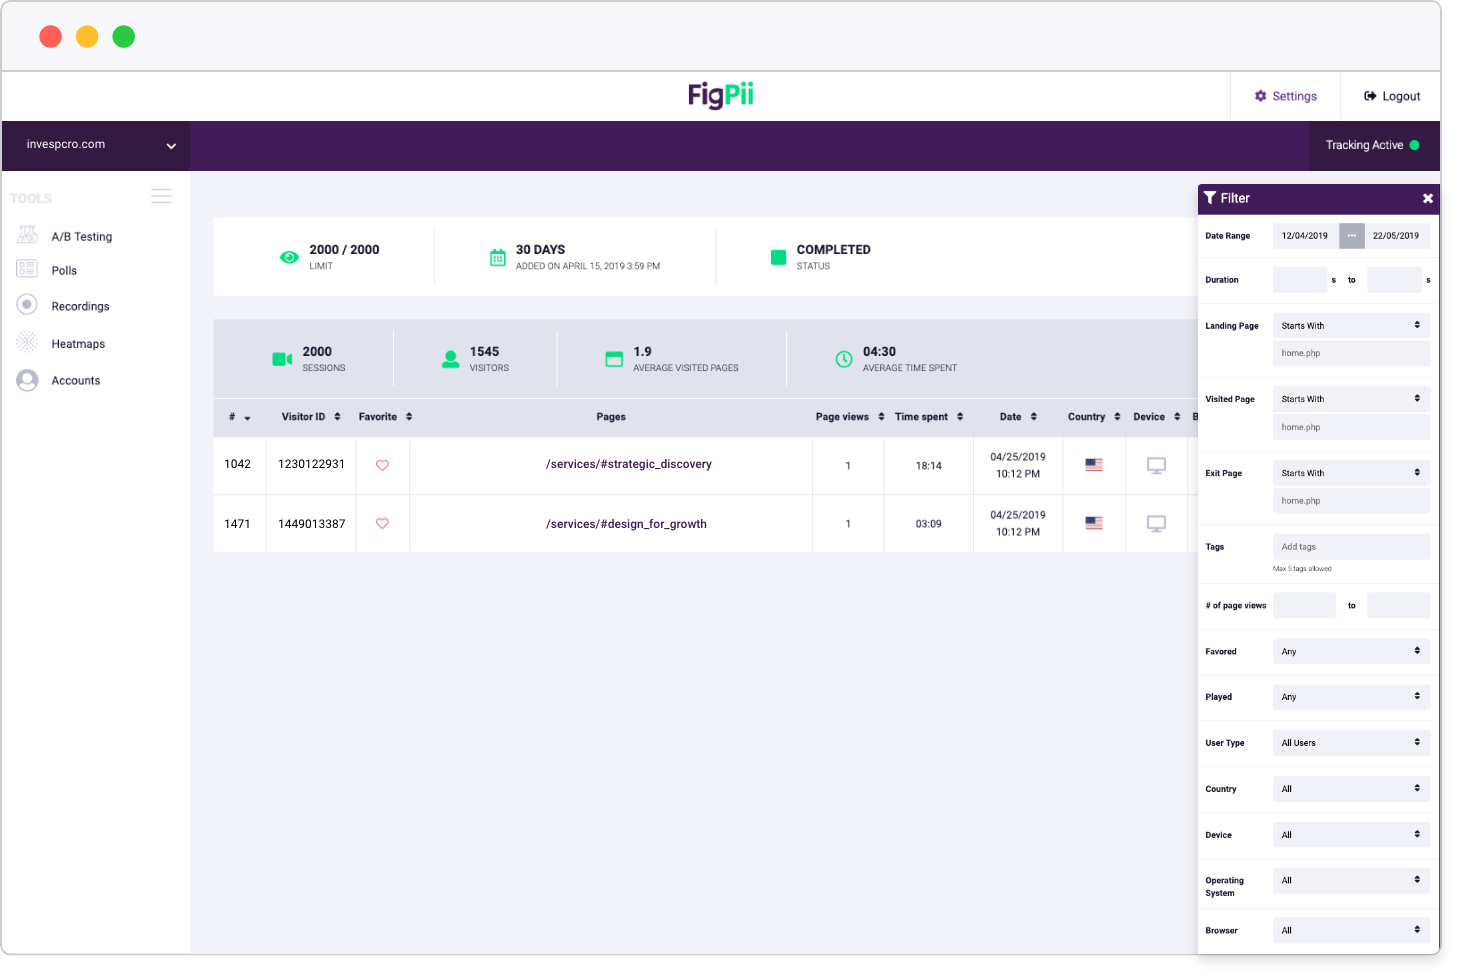 FigPii data filtering